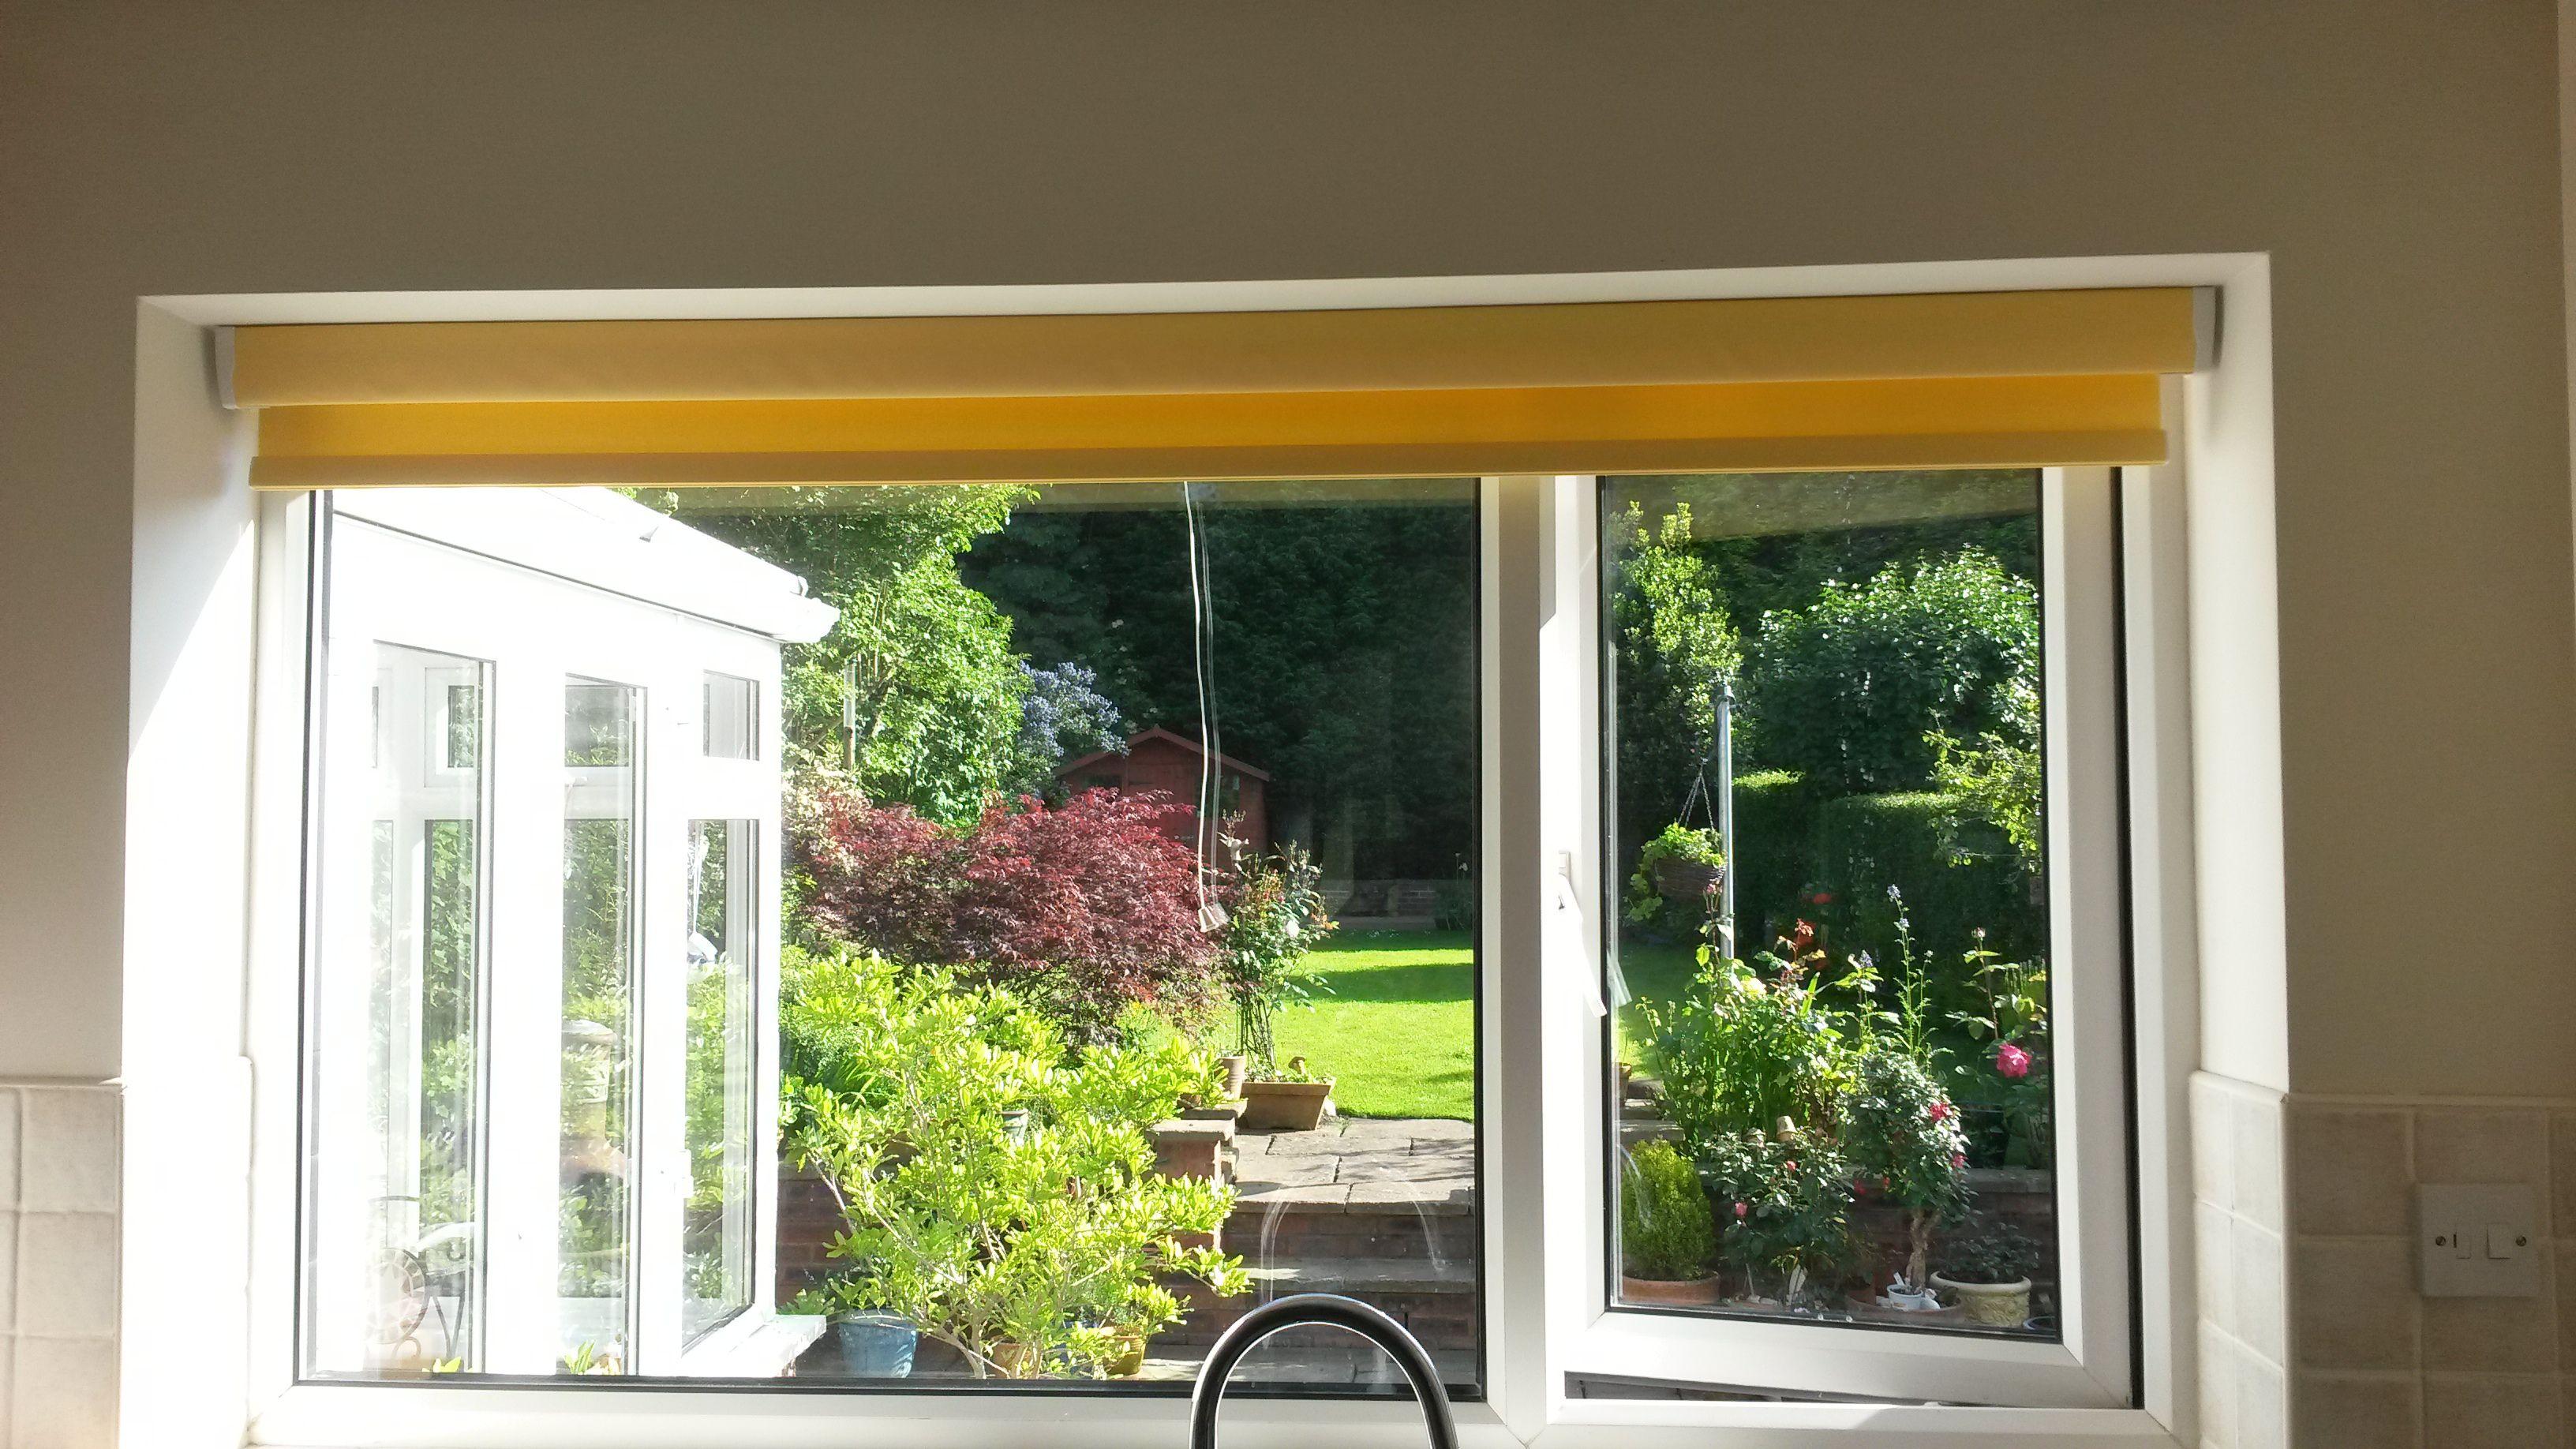 Soft Rise Roller Blind Child Safe Bright Yellow Kitchen